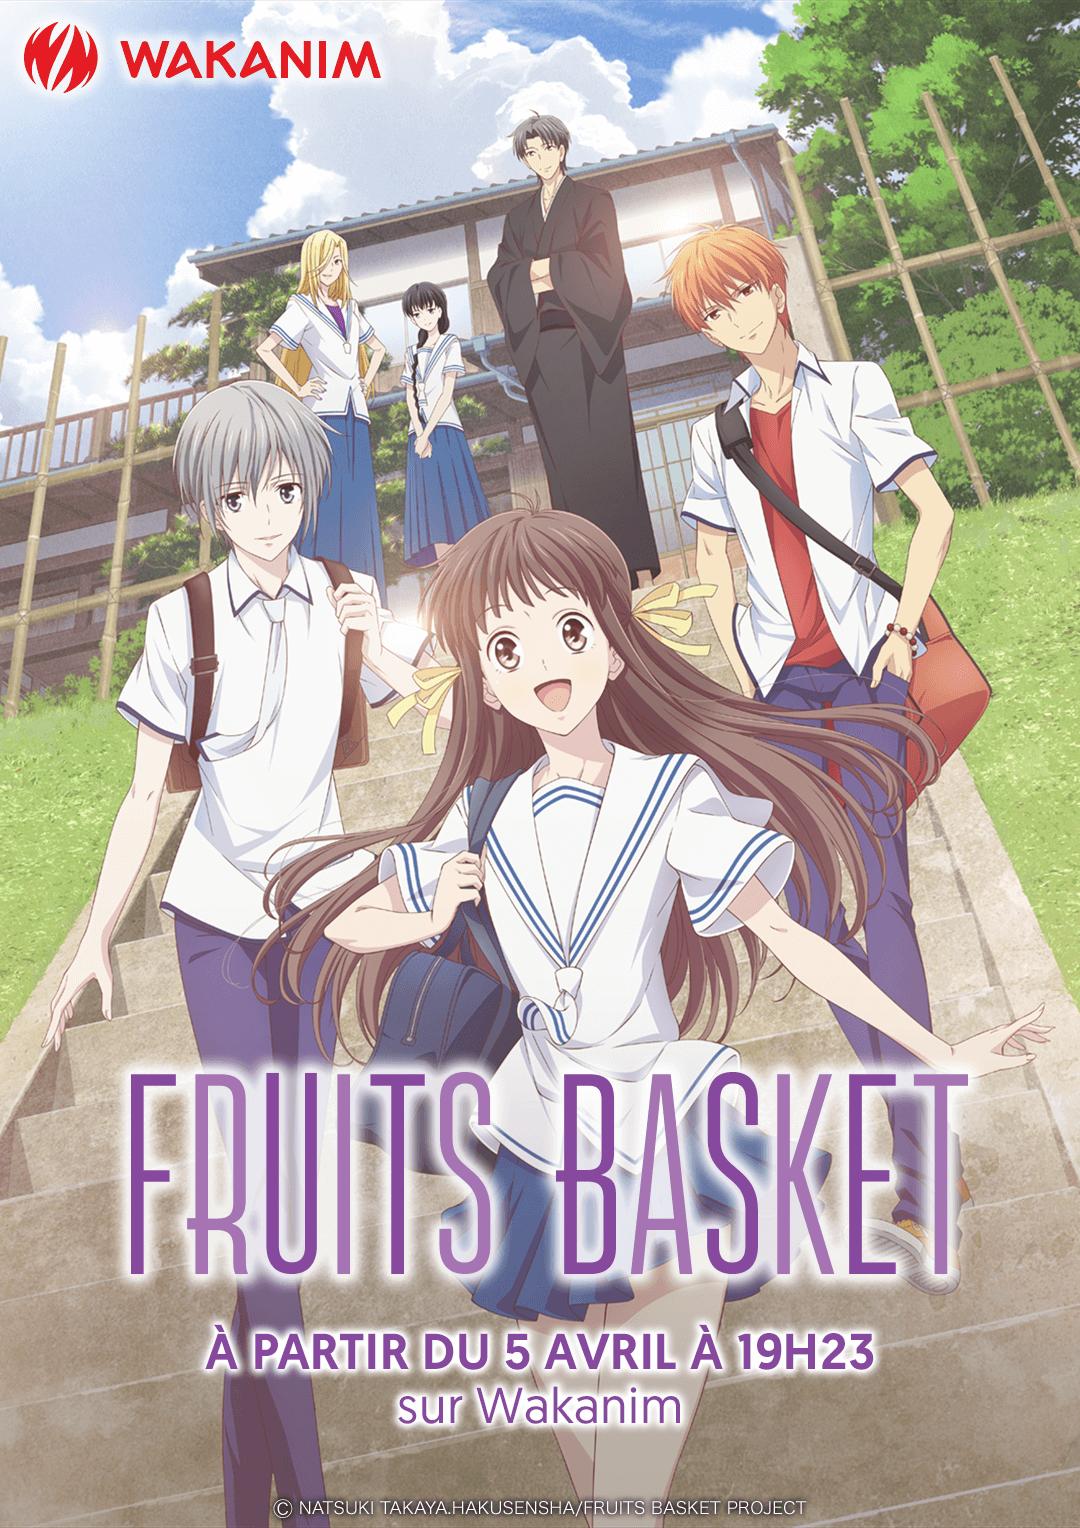 © NATSUKI TAKAYA.HAKUSENSHA/FRUITS BASKET PROJECT